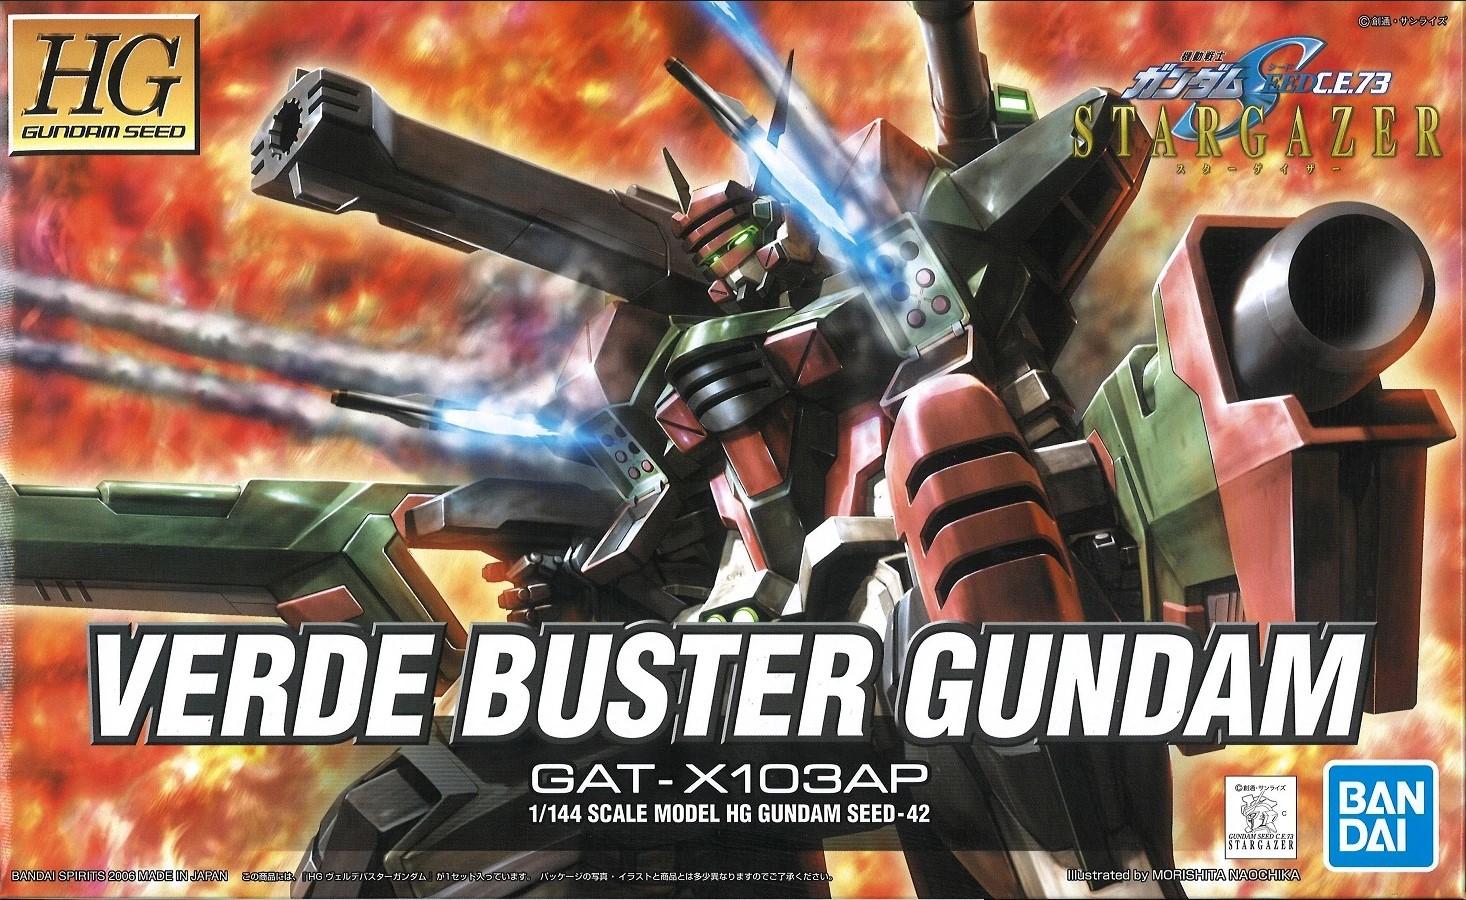 gundam-hg-seed-gat-x103ap-verde-buster-gundam